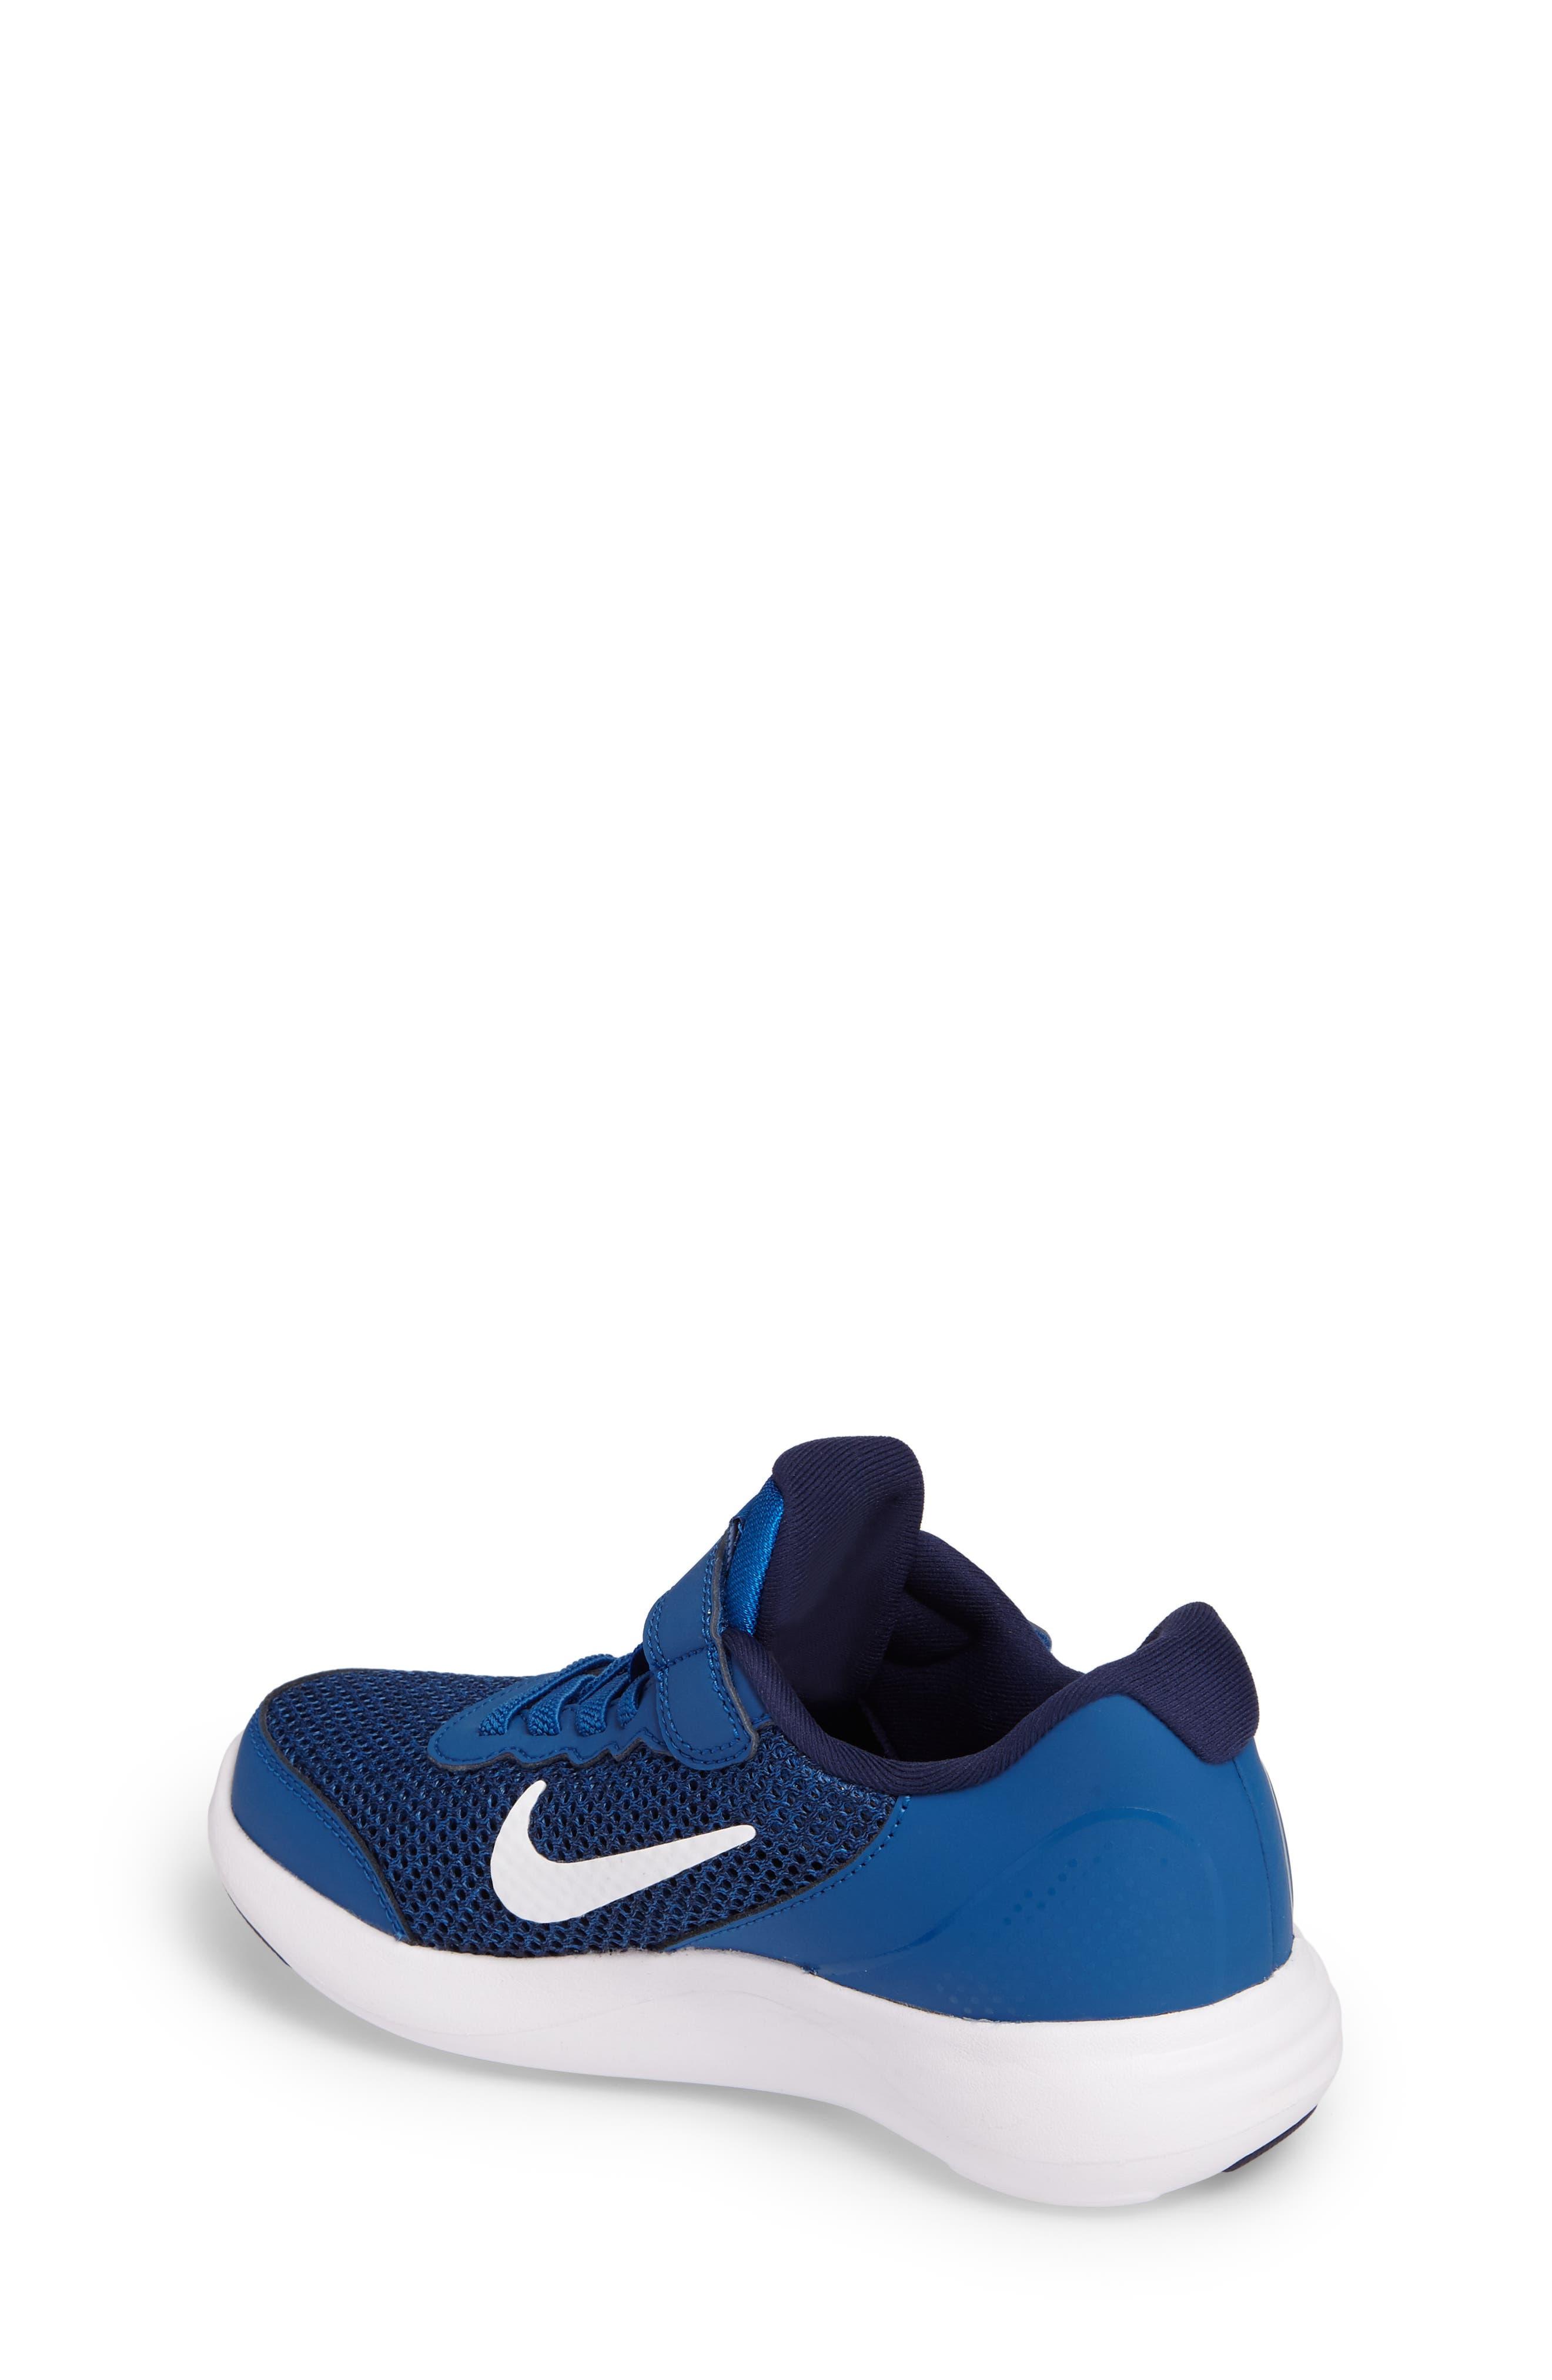 Lunar Apparent Sneaker,                             Alternate thumbnail 2, color,                             Blue Jay/ White/ Binary Blue